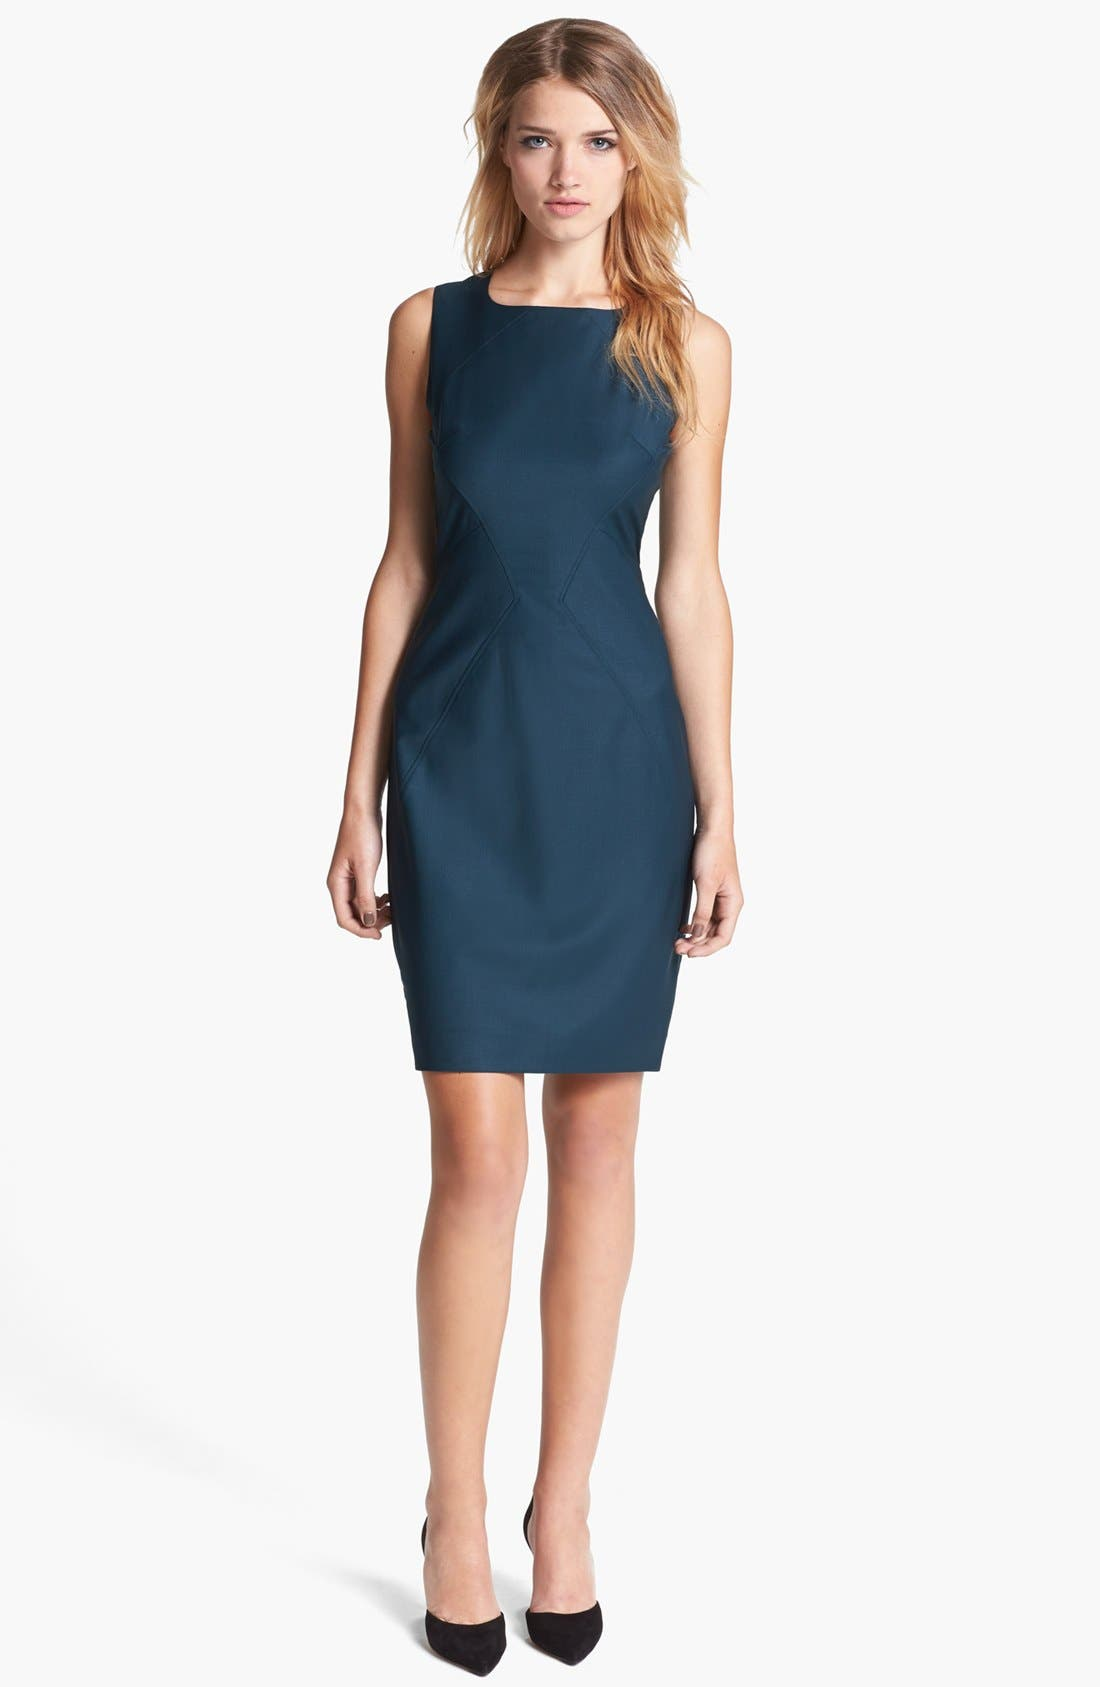 Alternate Image 1 Selected - Ted Baker London 'Shiny Lavanta' Sheath Dress